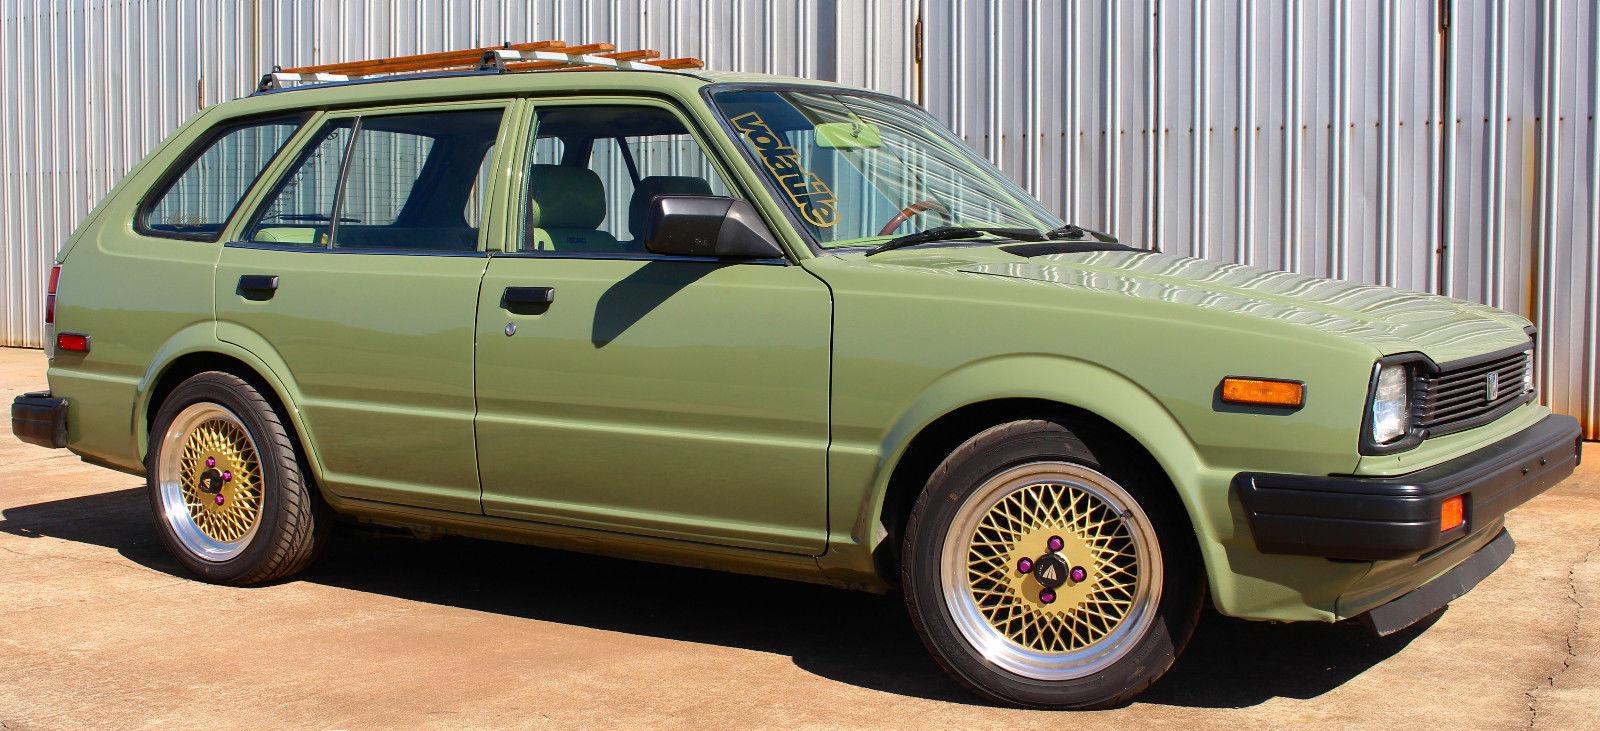 For Sale 1983 Honda Civic Wagon With A B18b Engine Swap